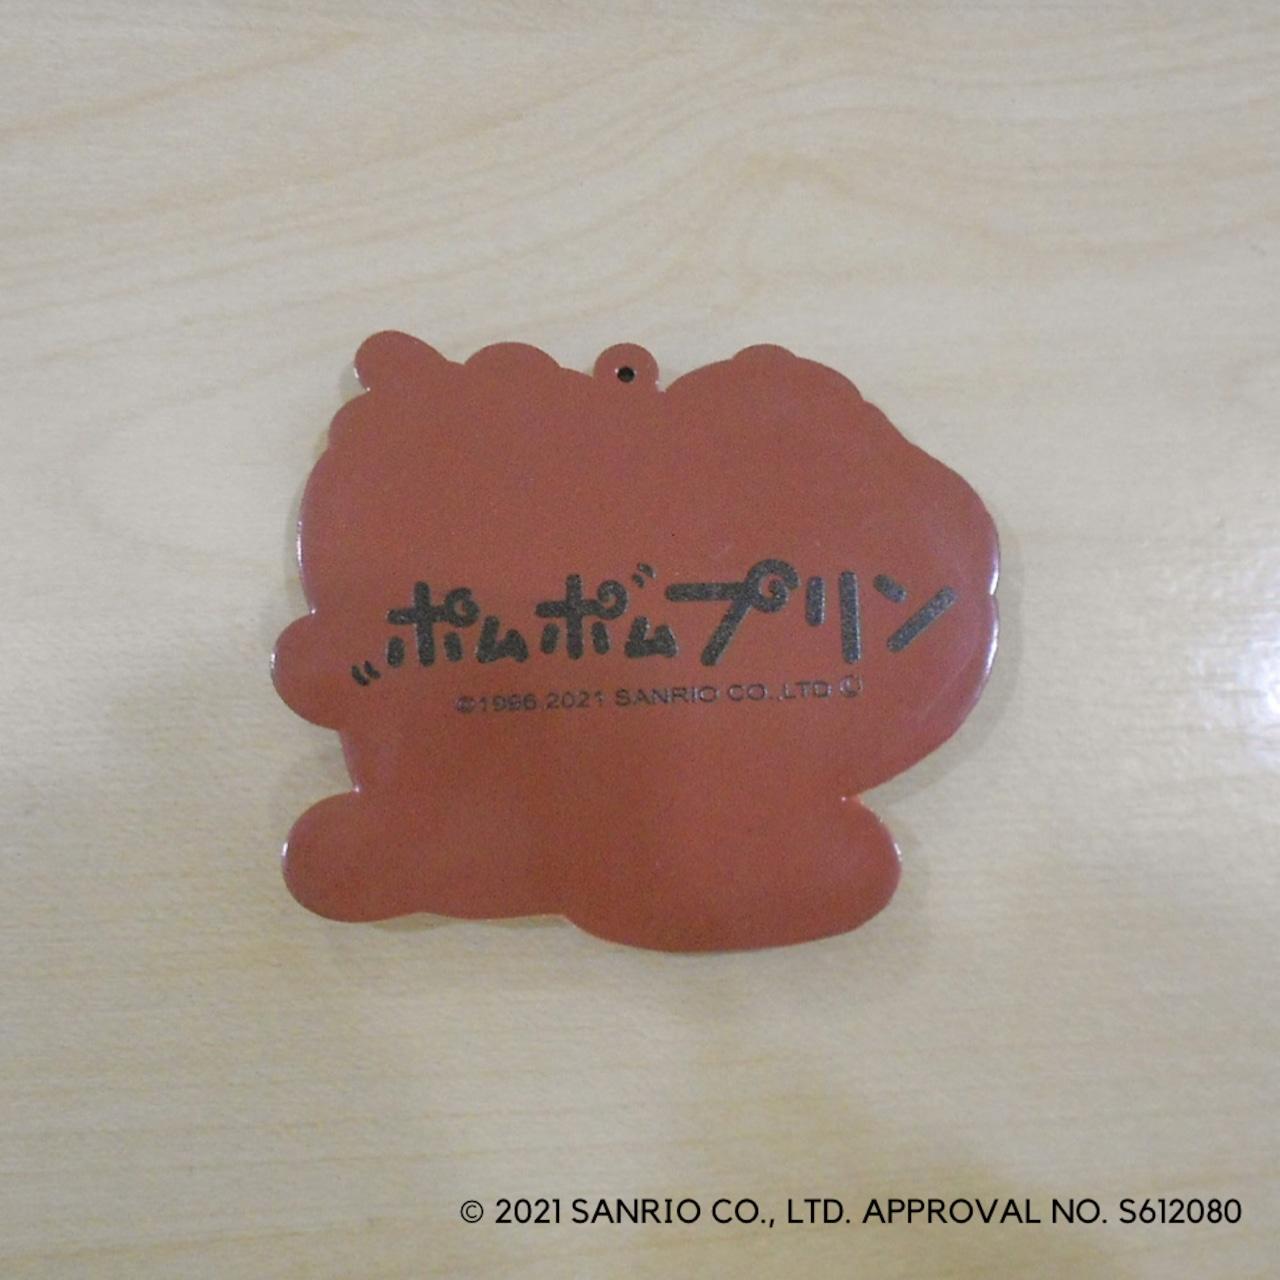 FANCYSANRIOCHARACTERS×tsumikipocheのラバーマスコット